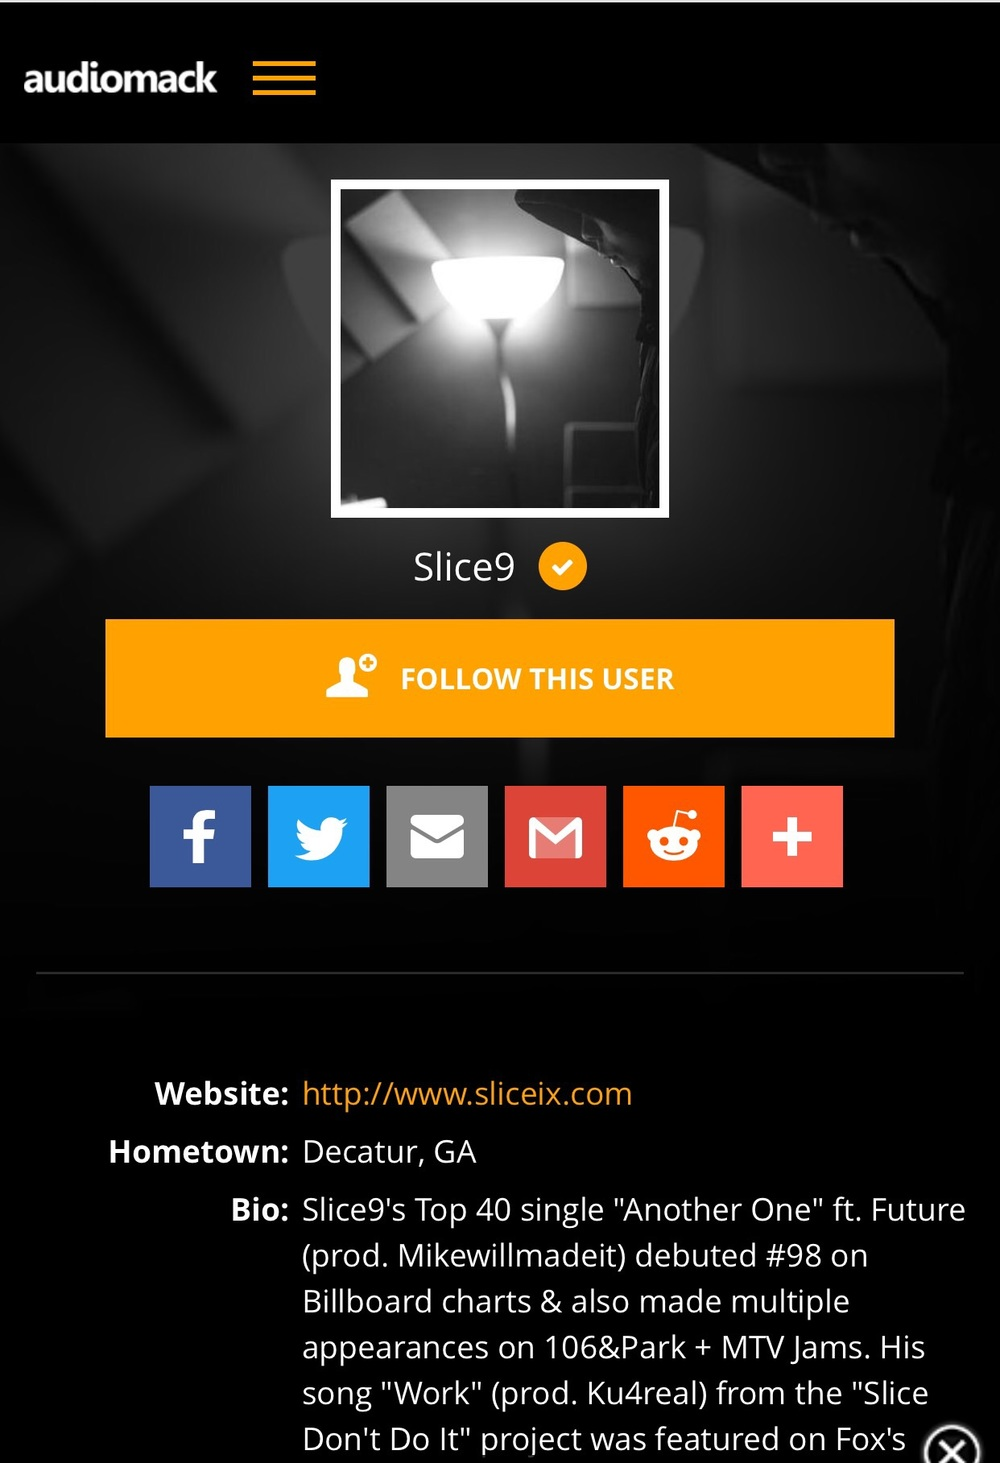 http://m.audiomack.com/artist/slice9